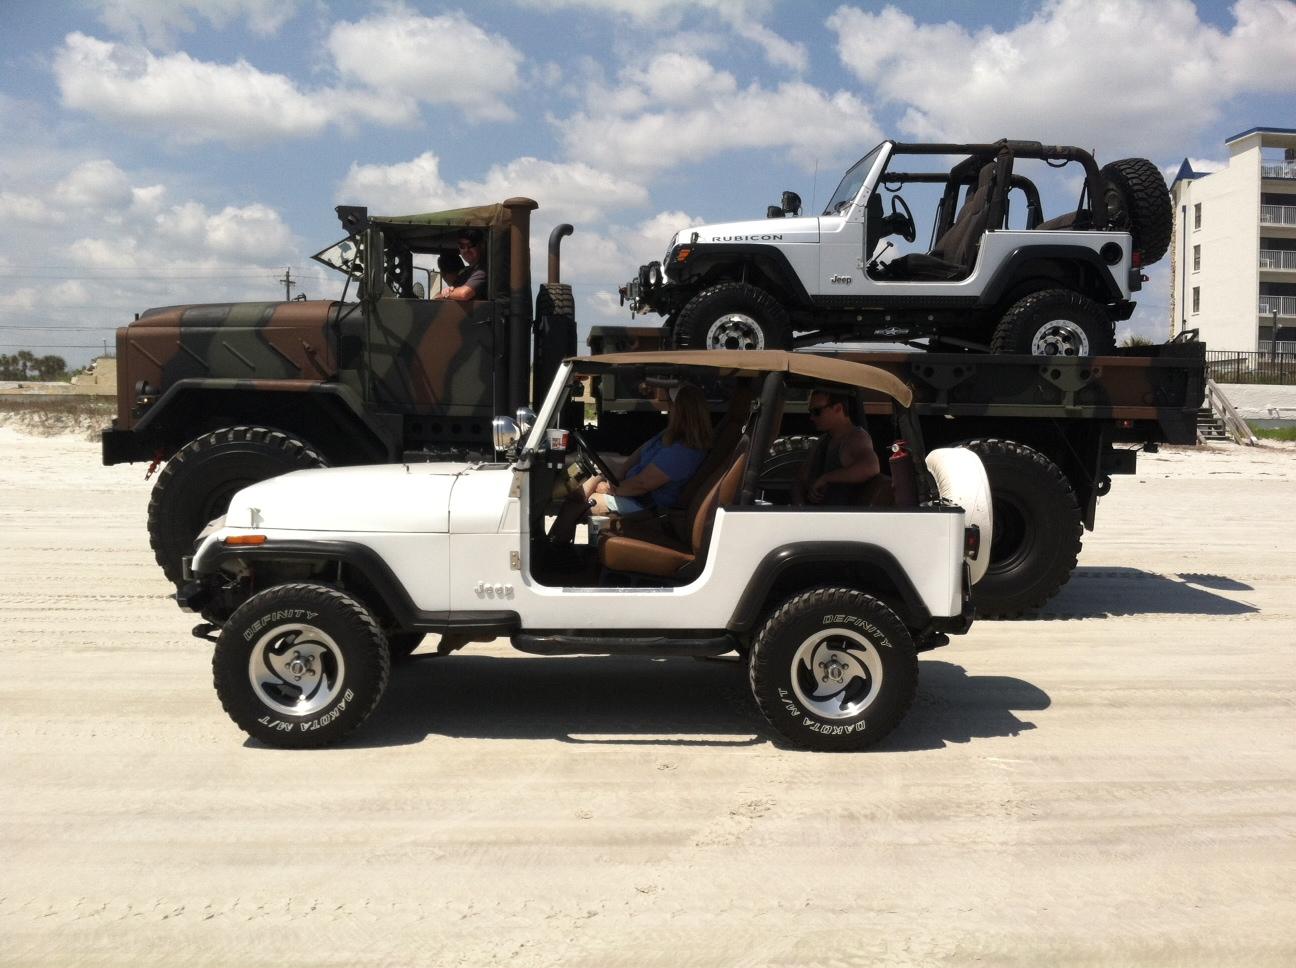 jeep-beach3.jpg